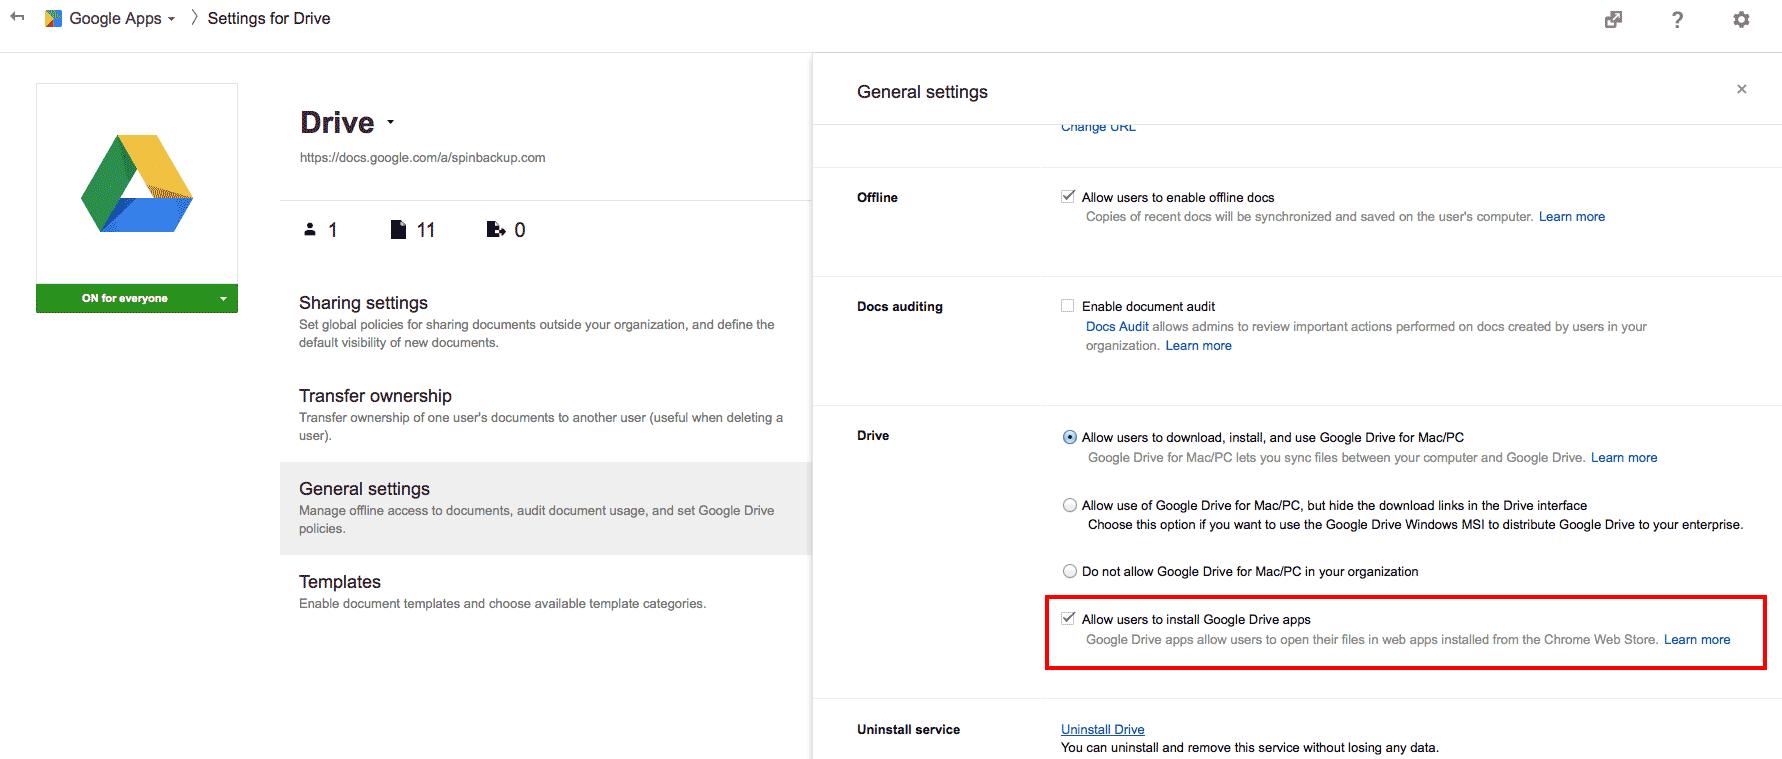 google drive download error